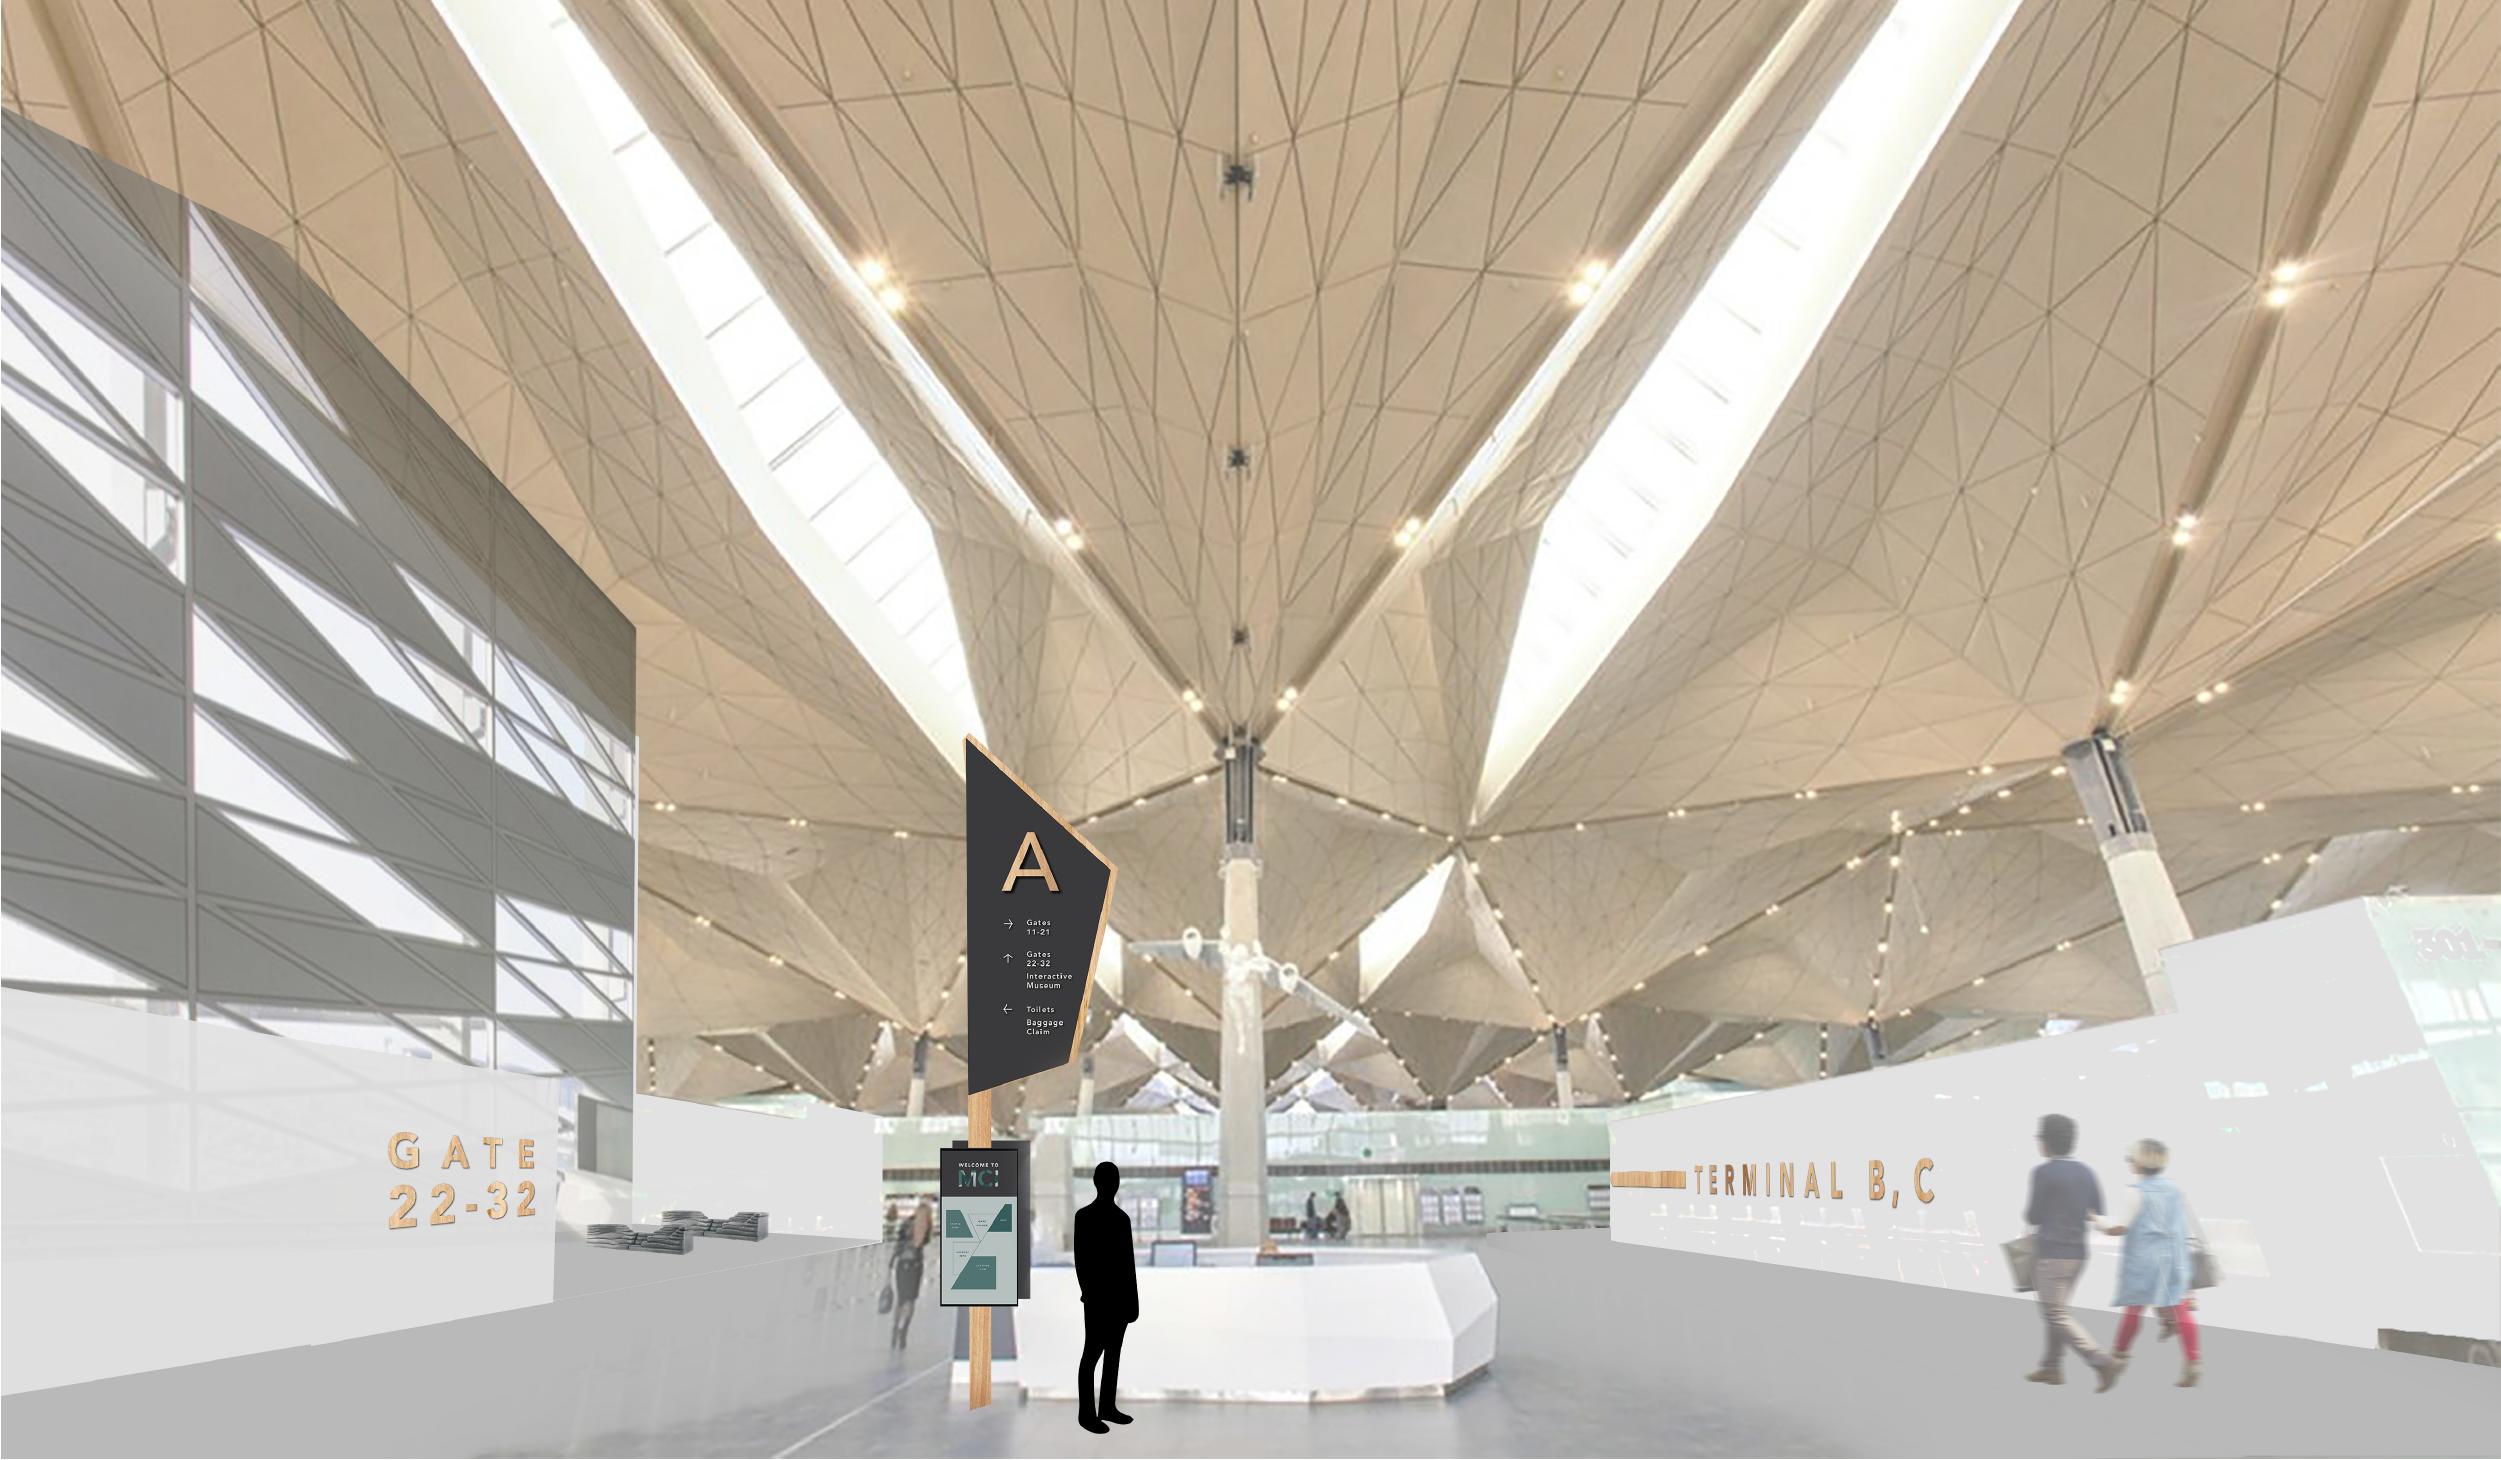 architecture rendering interior of airport